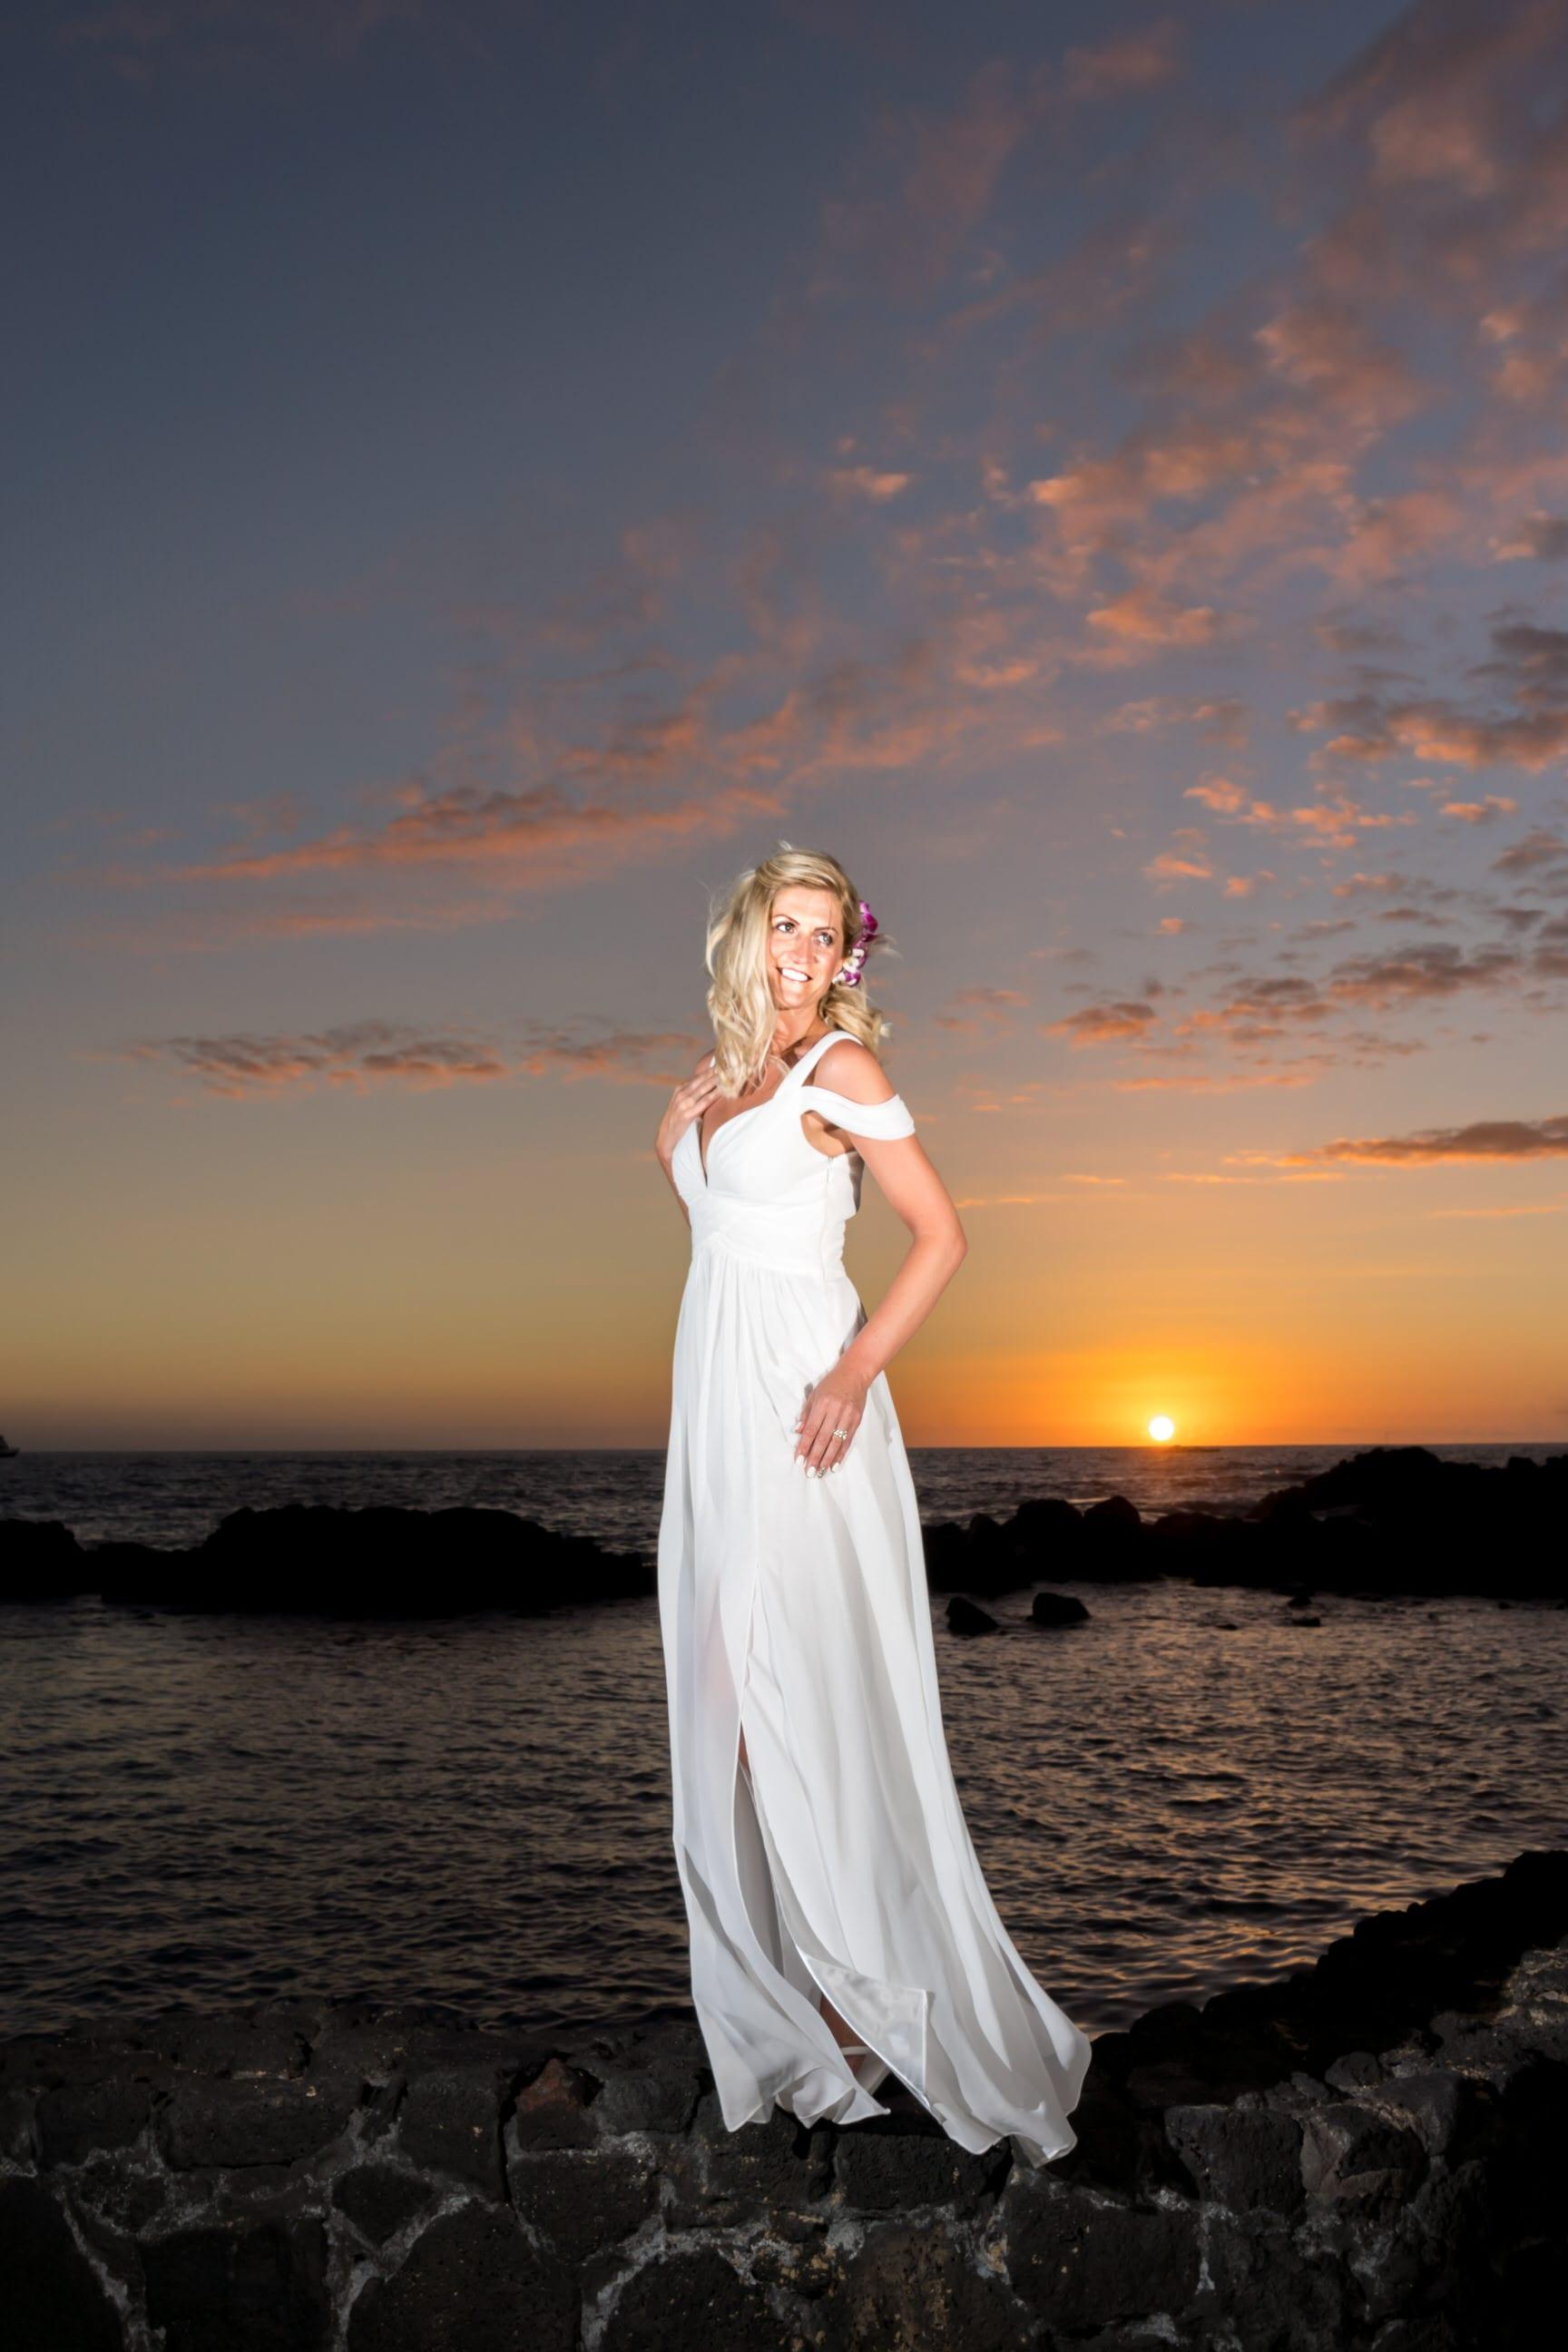 Roya-Kona-Resort-Elopement-Elzbieta-Piotr-hawaii-photographer4.jpg